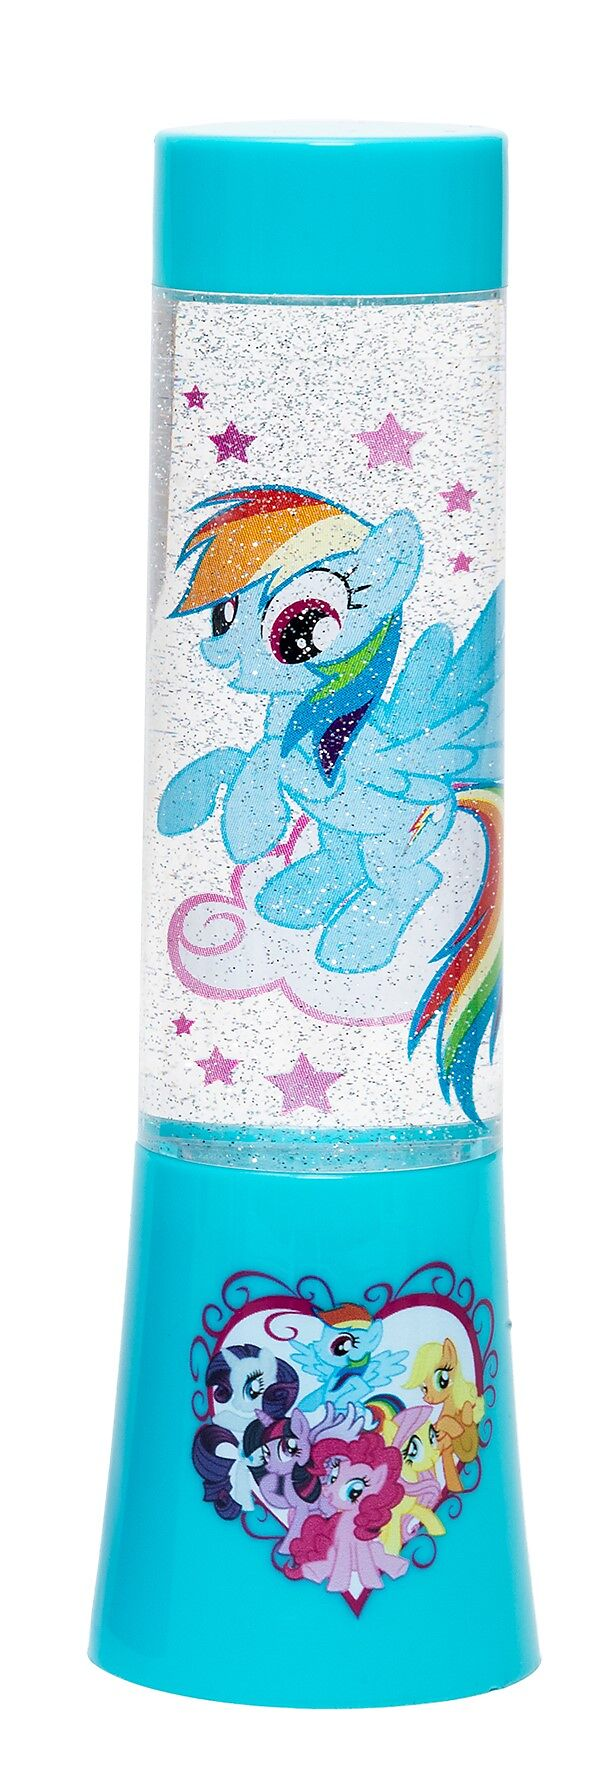 Pony My Rainbow Lampe Led Little Dash mIf6yg7Ybv